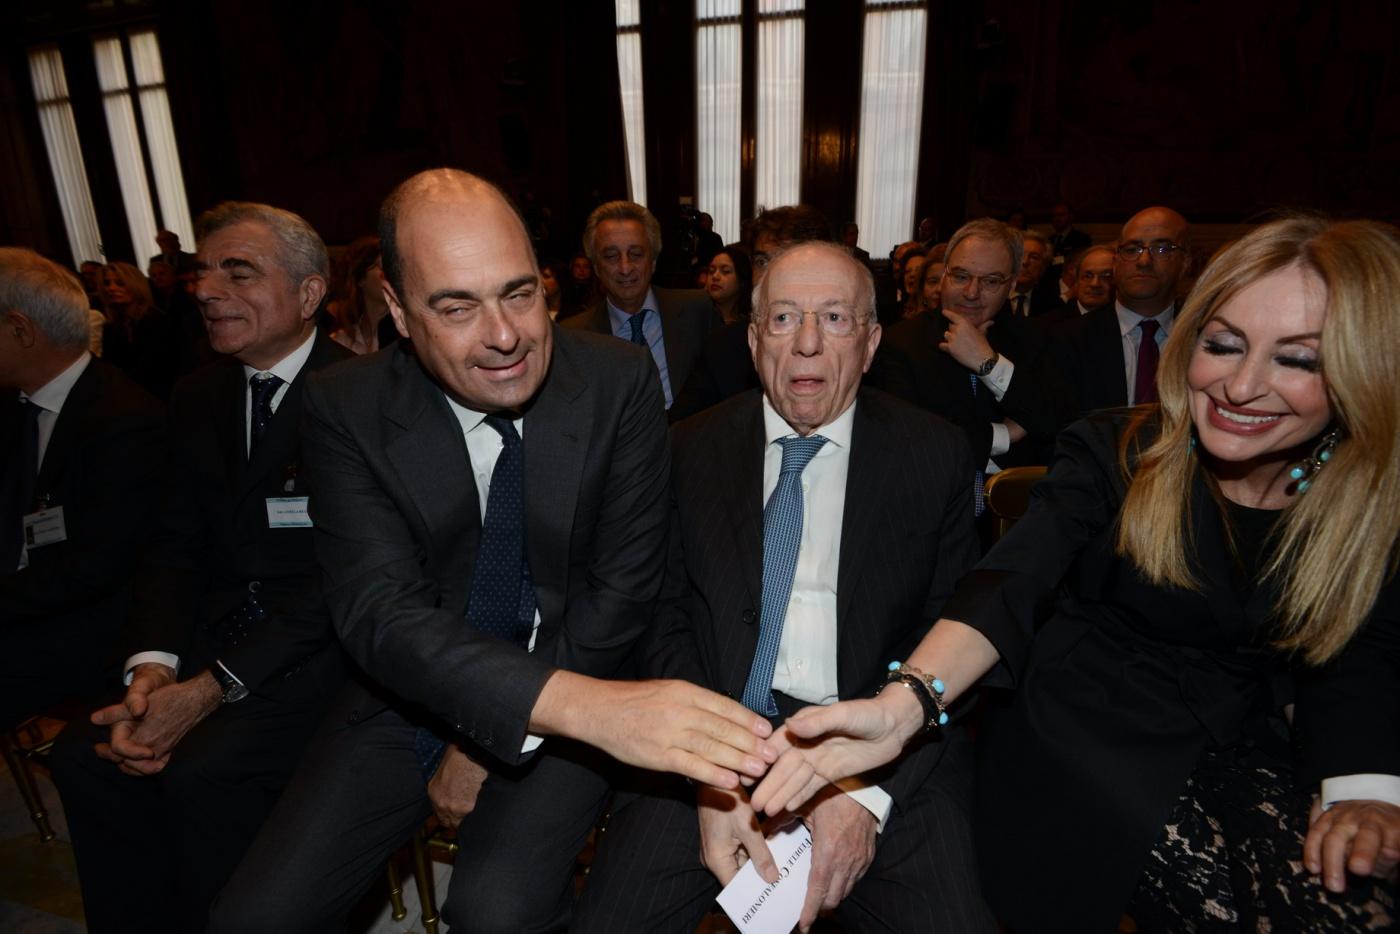 Mauro Moretti, Nicola Zingaretti e Fedele Confalonieri